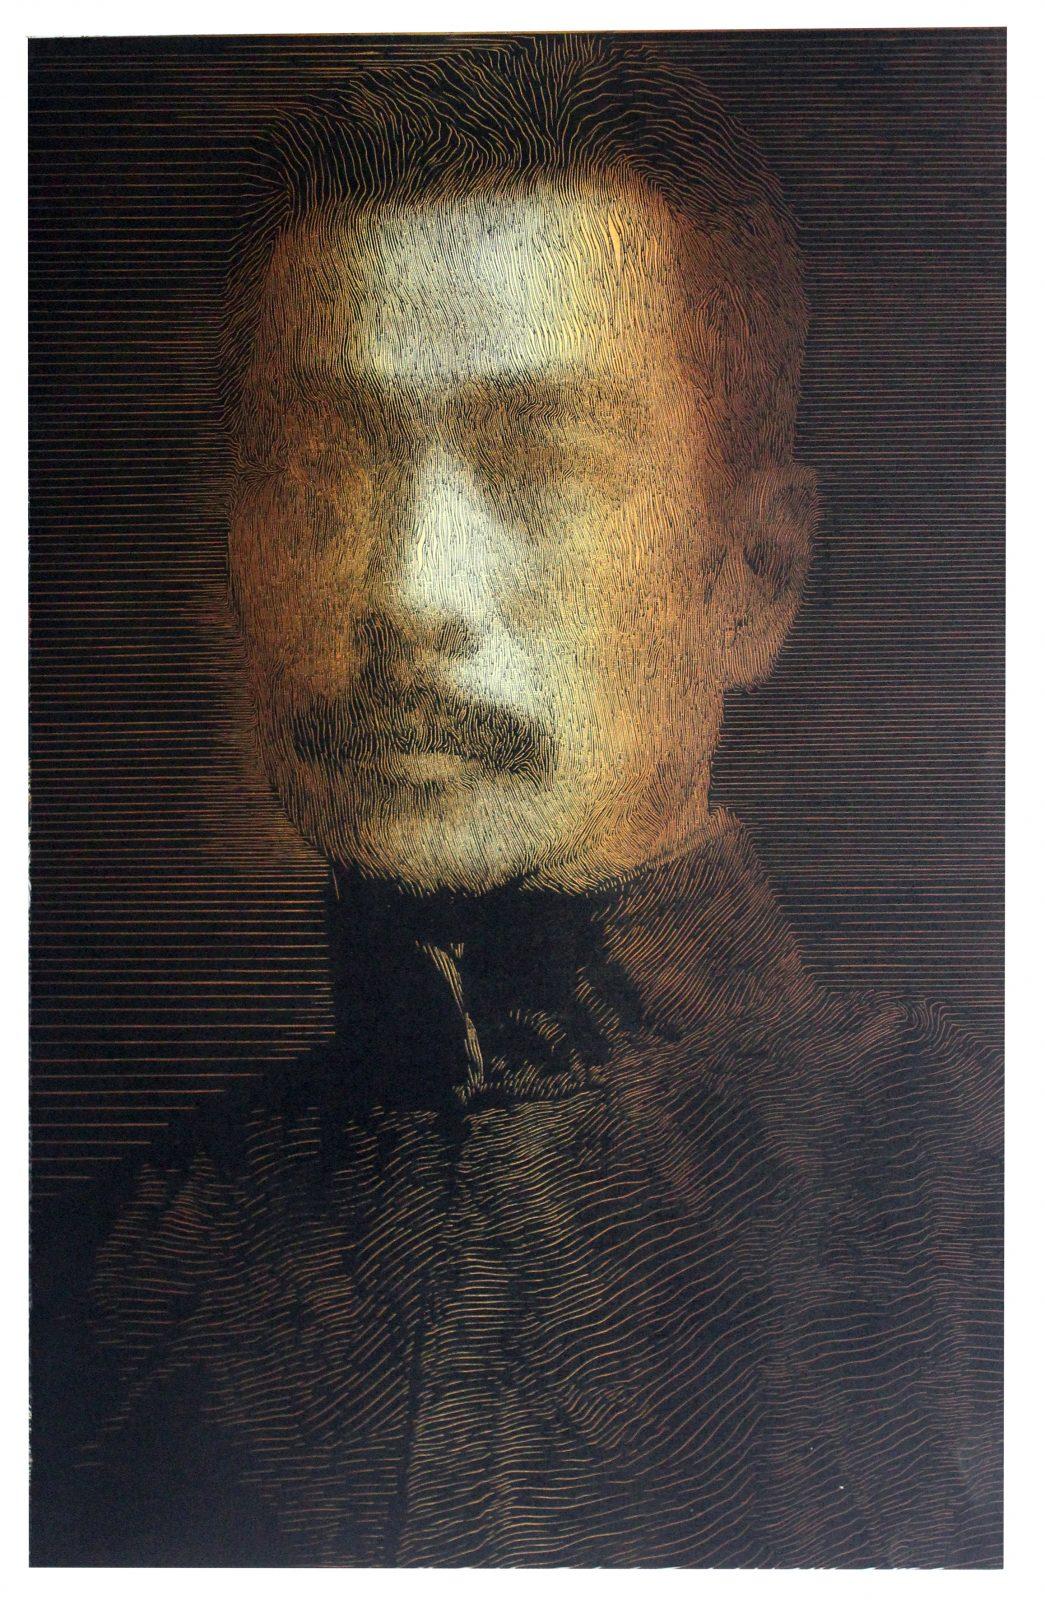 Master 02 '大师 02', Liu Jing 刘京, 90 x 60 cm, 2017 copy